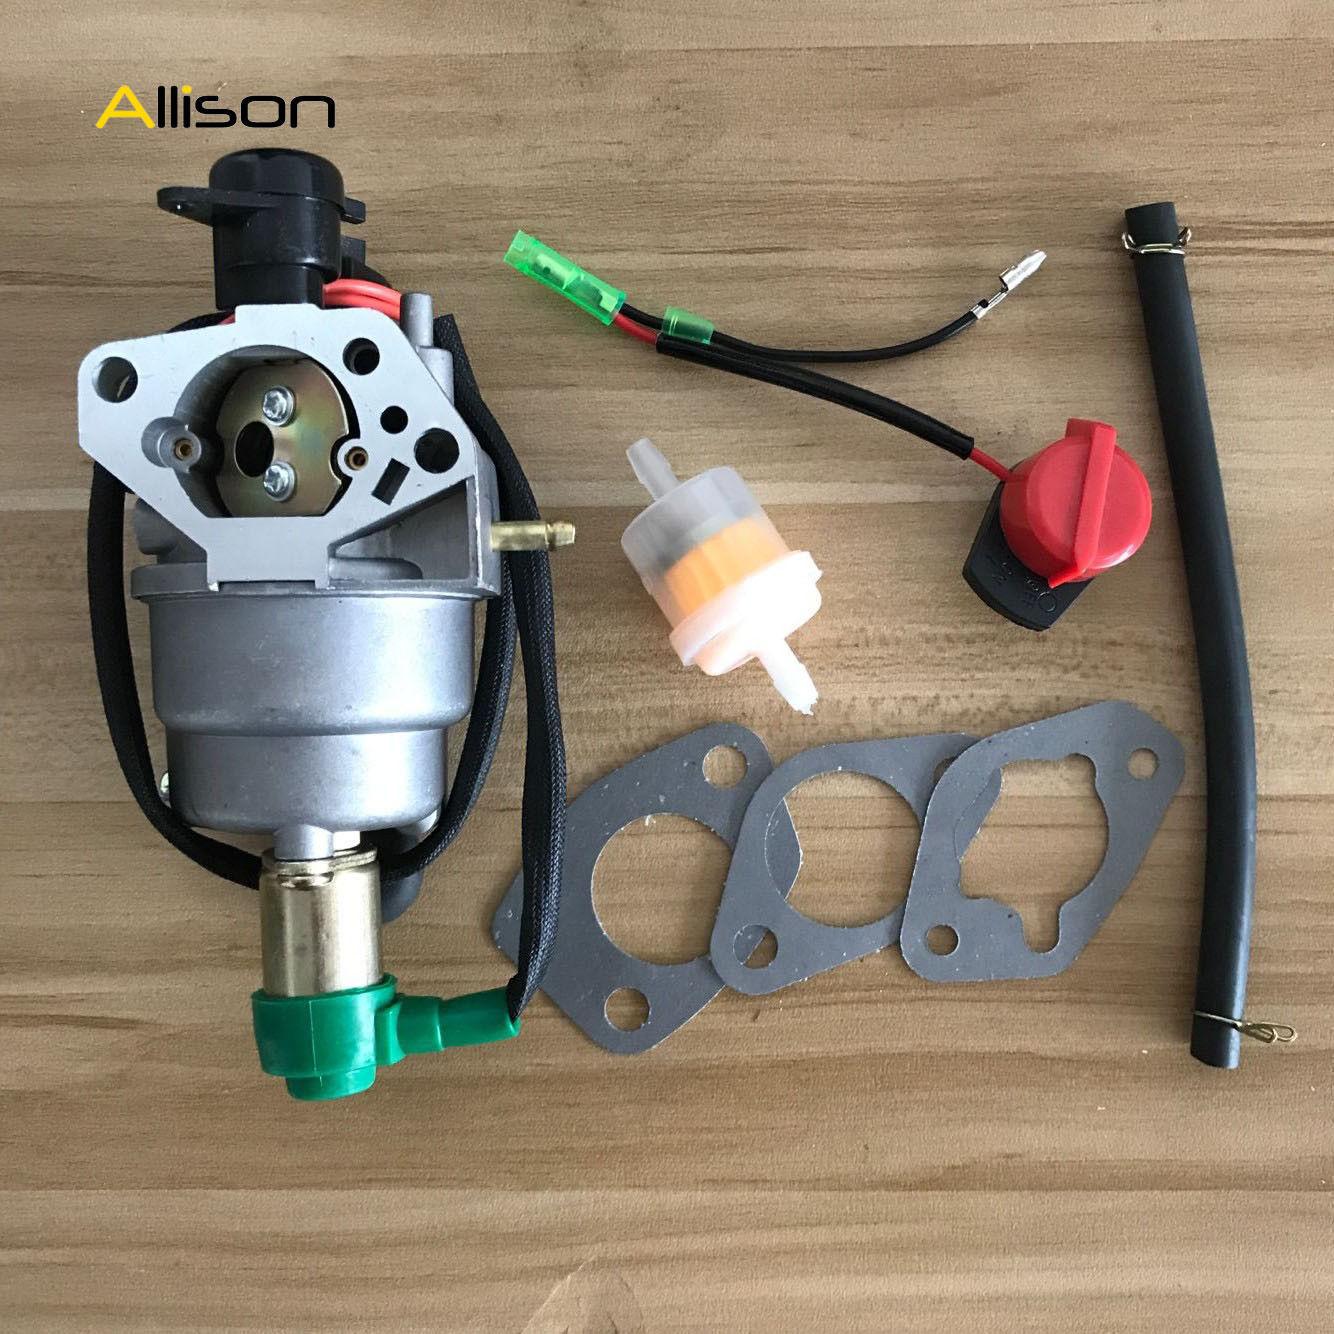 [SCHEMATICS_48YU]  Carburetor Fuel Filter F Mc Culloch FG5700 and 28 similar items | Mcculloch Fuel Filter |  | Bonanza